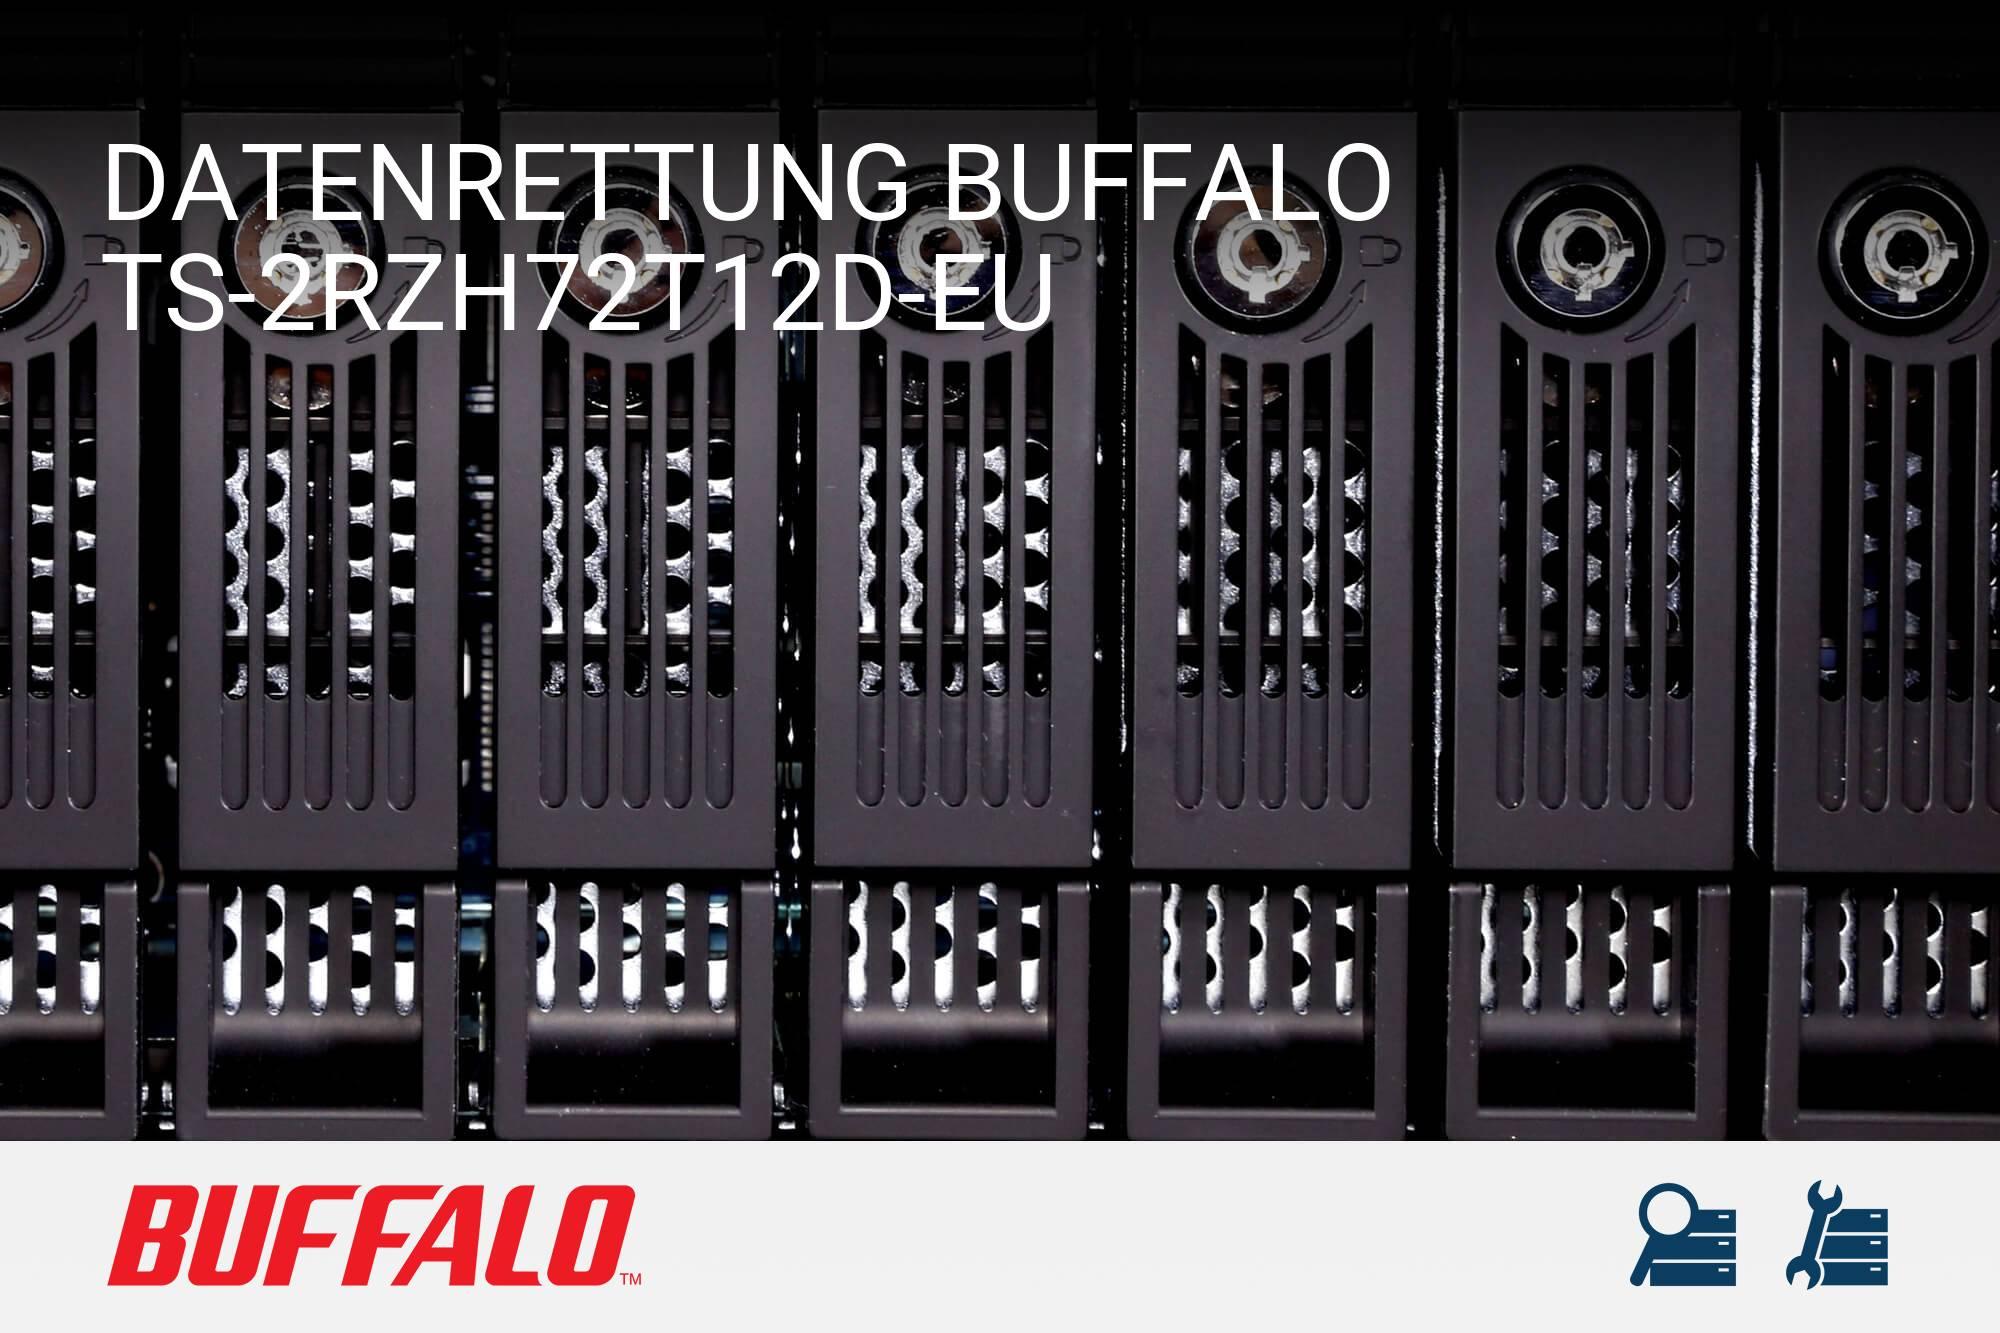 Buffalo TS-2RZH72T12D-EU